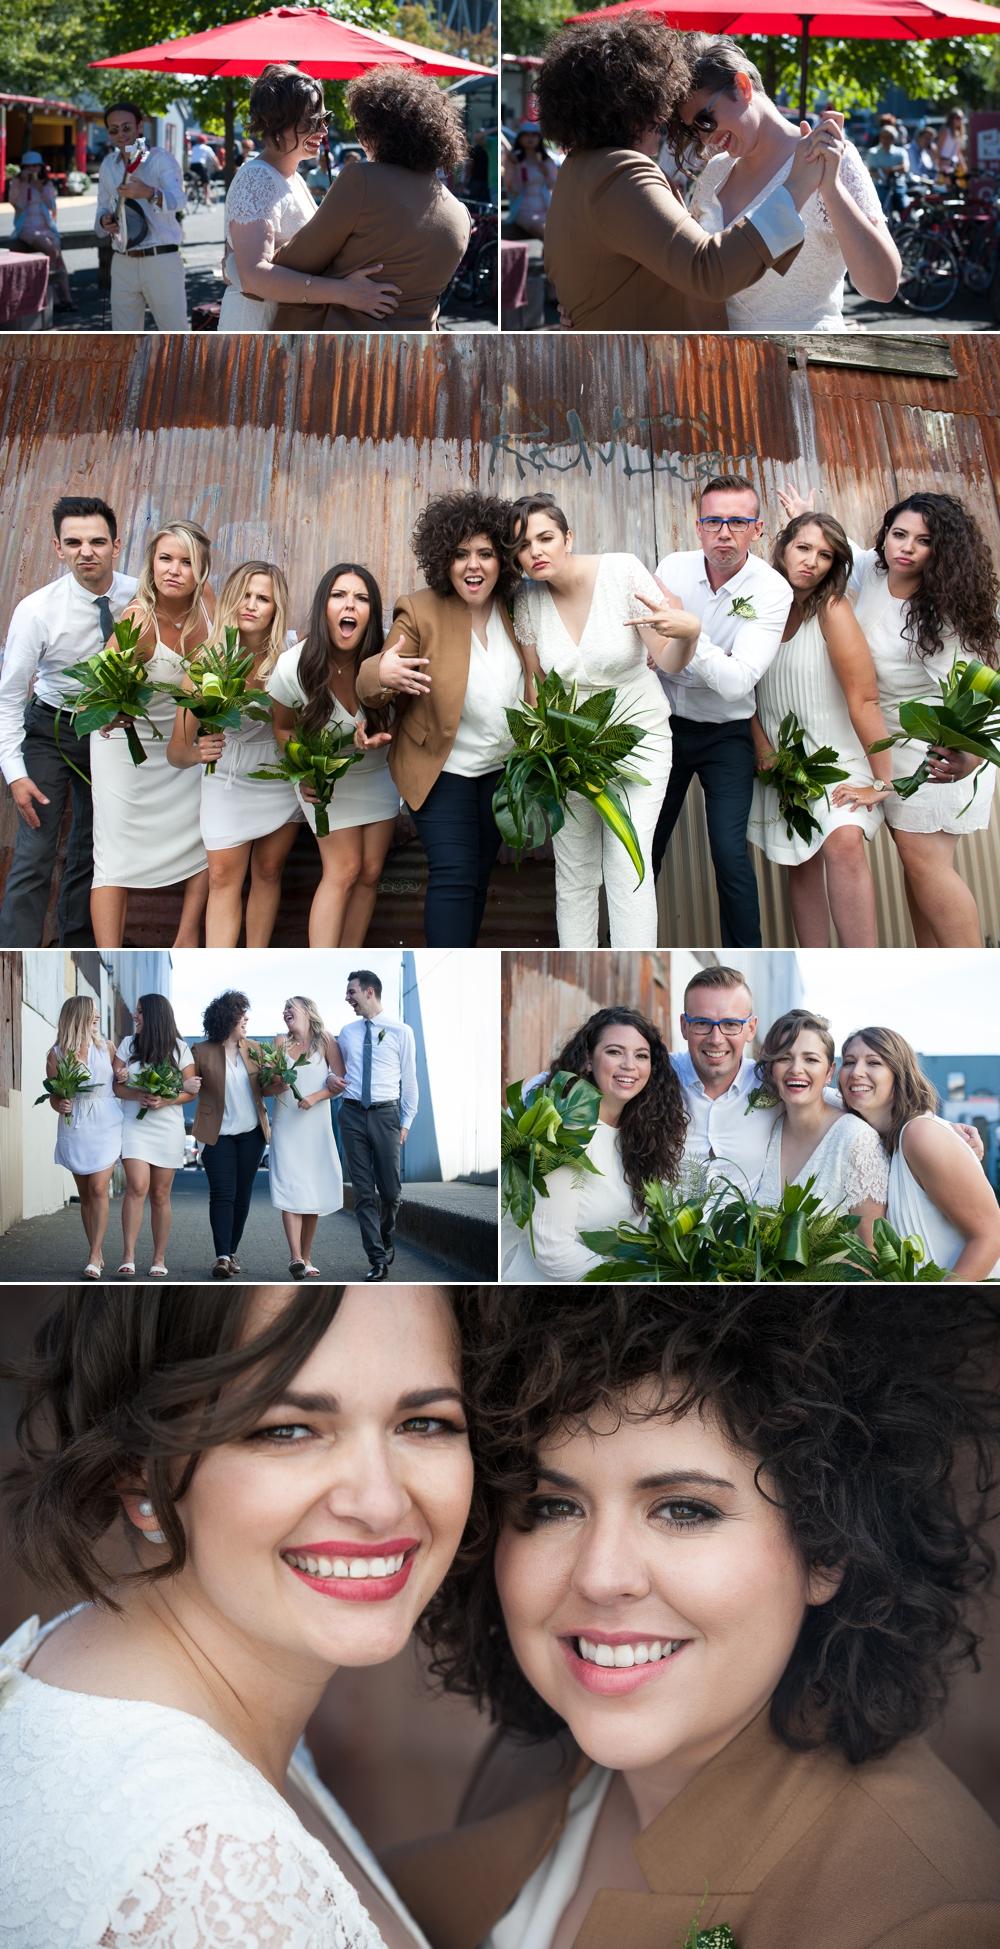 vancouver-lesbian-wedding-belle-ancell_05.jpg